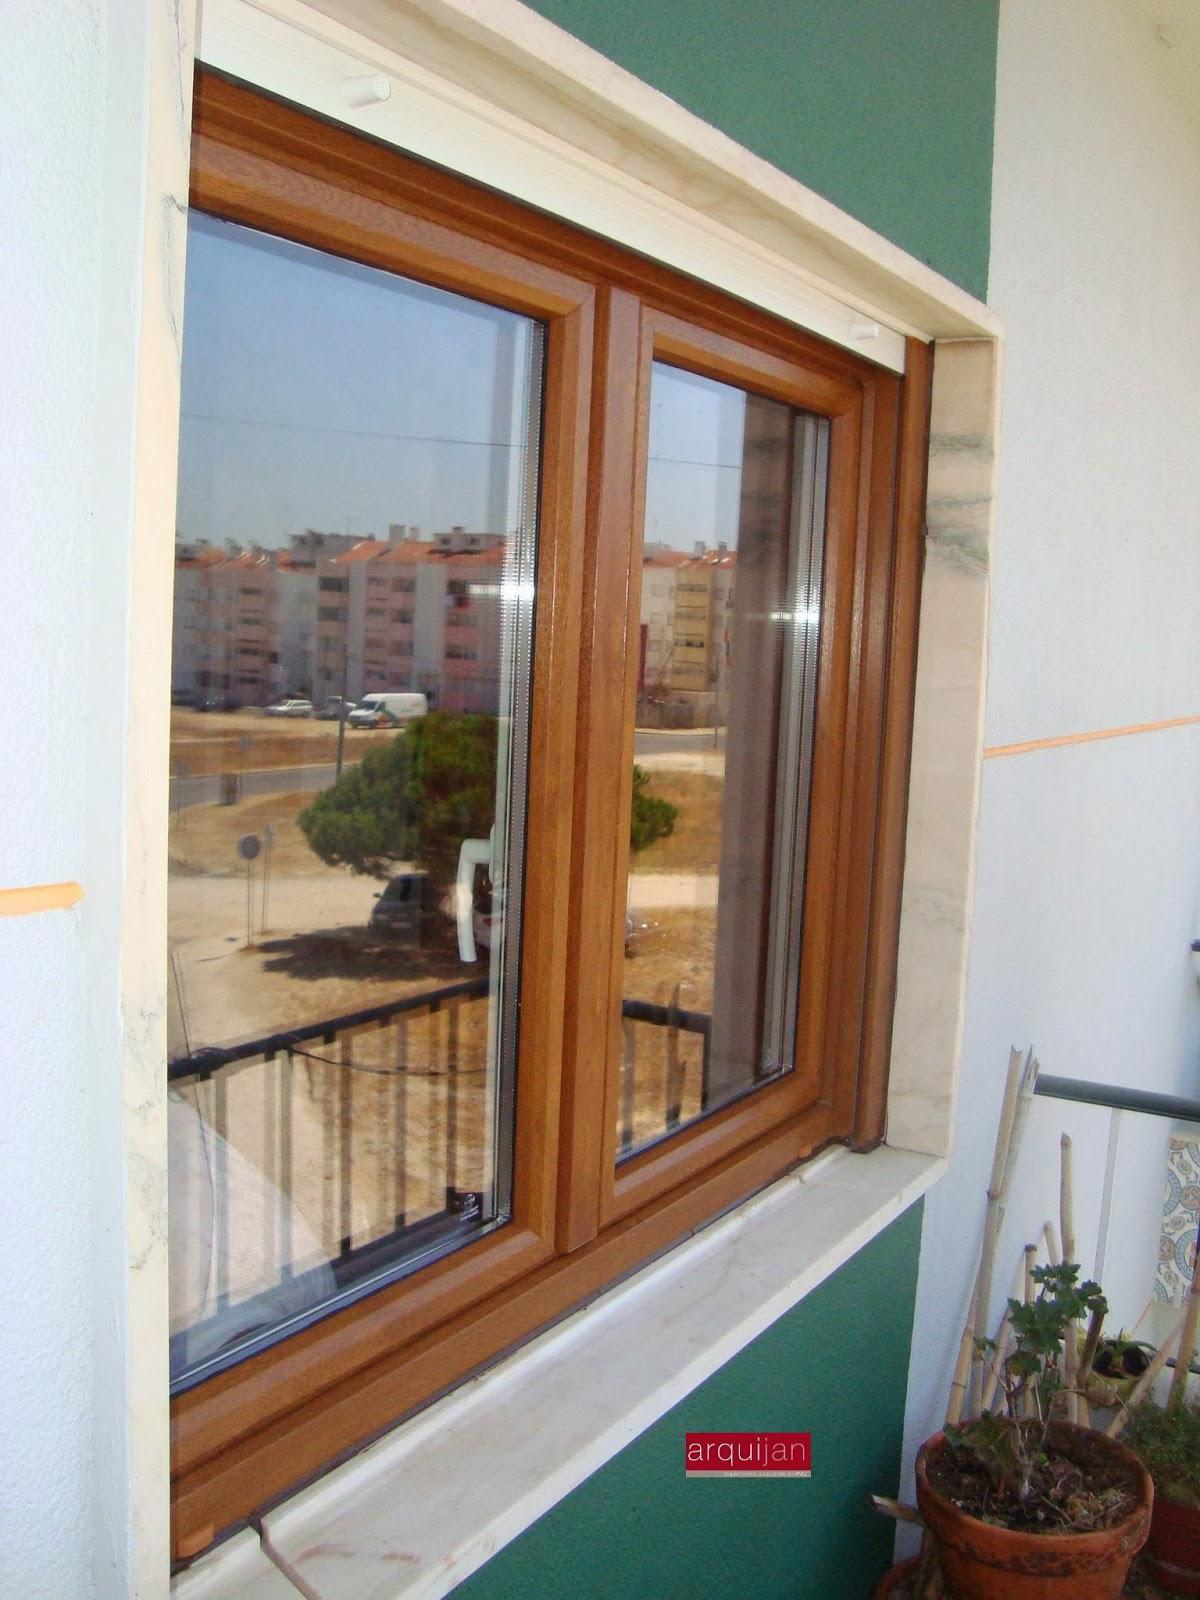 #744127  Janelas Alumínio Portas Alumínio Marquises: Trocar janelas de 1672 Janela De Aluminio Manutenção